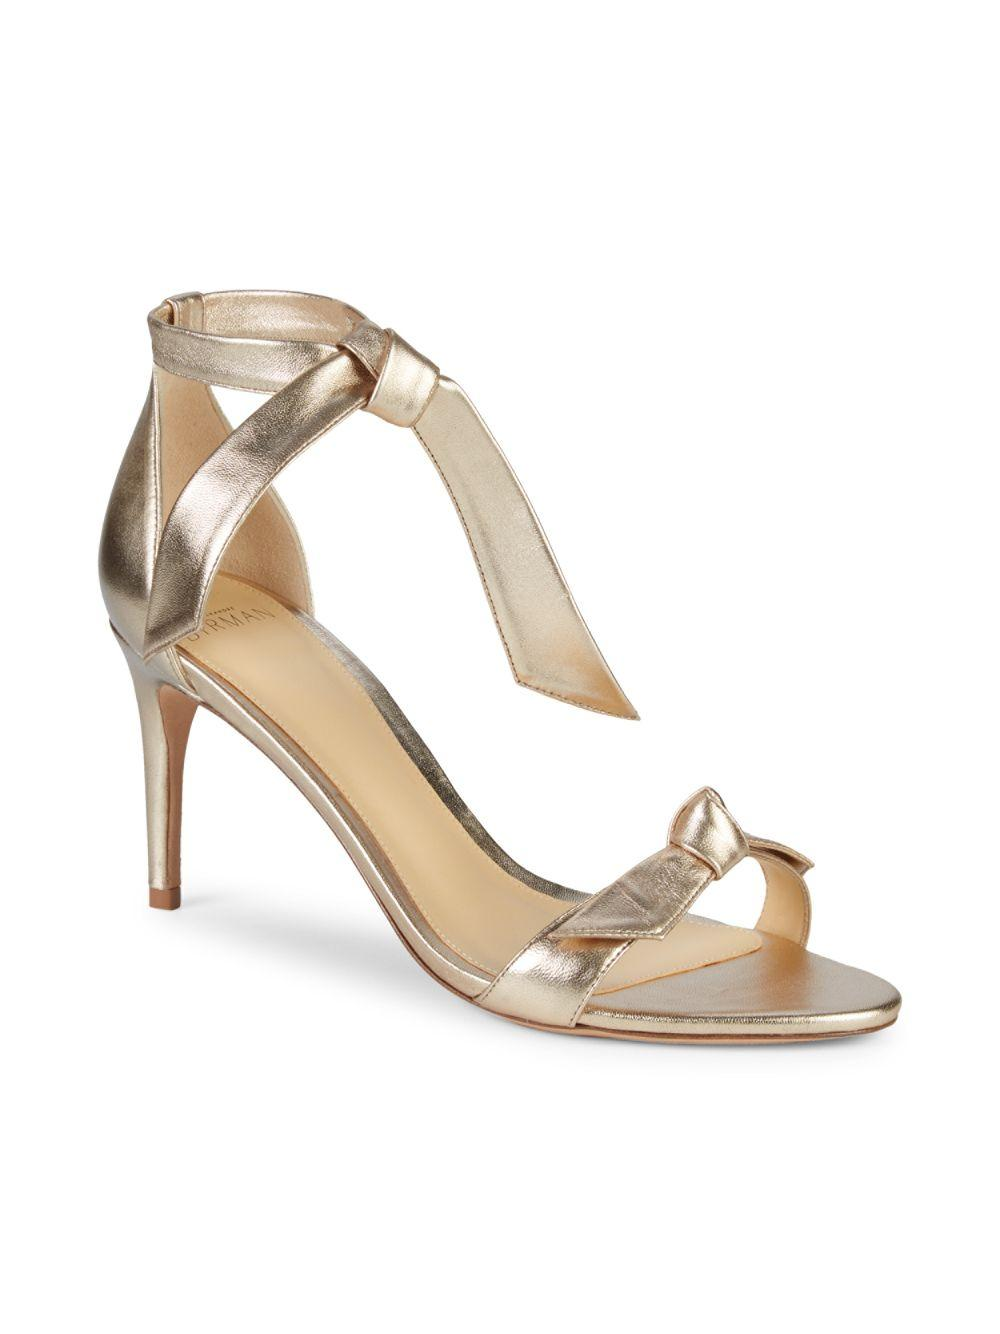 c3b501bc528 Alexandre Birman Clarita Leather Sandals in Natural - Lyst